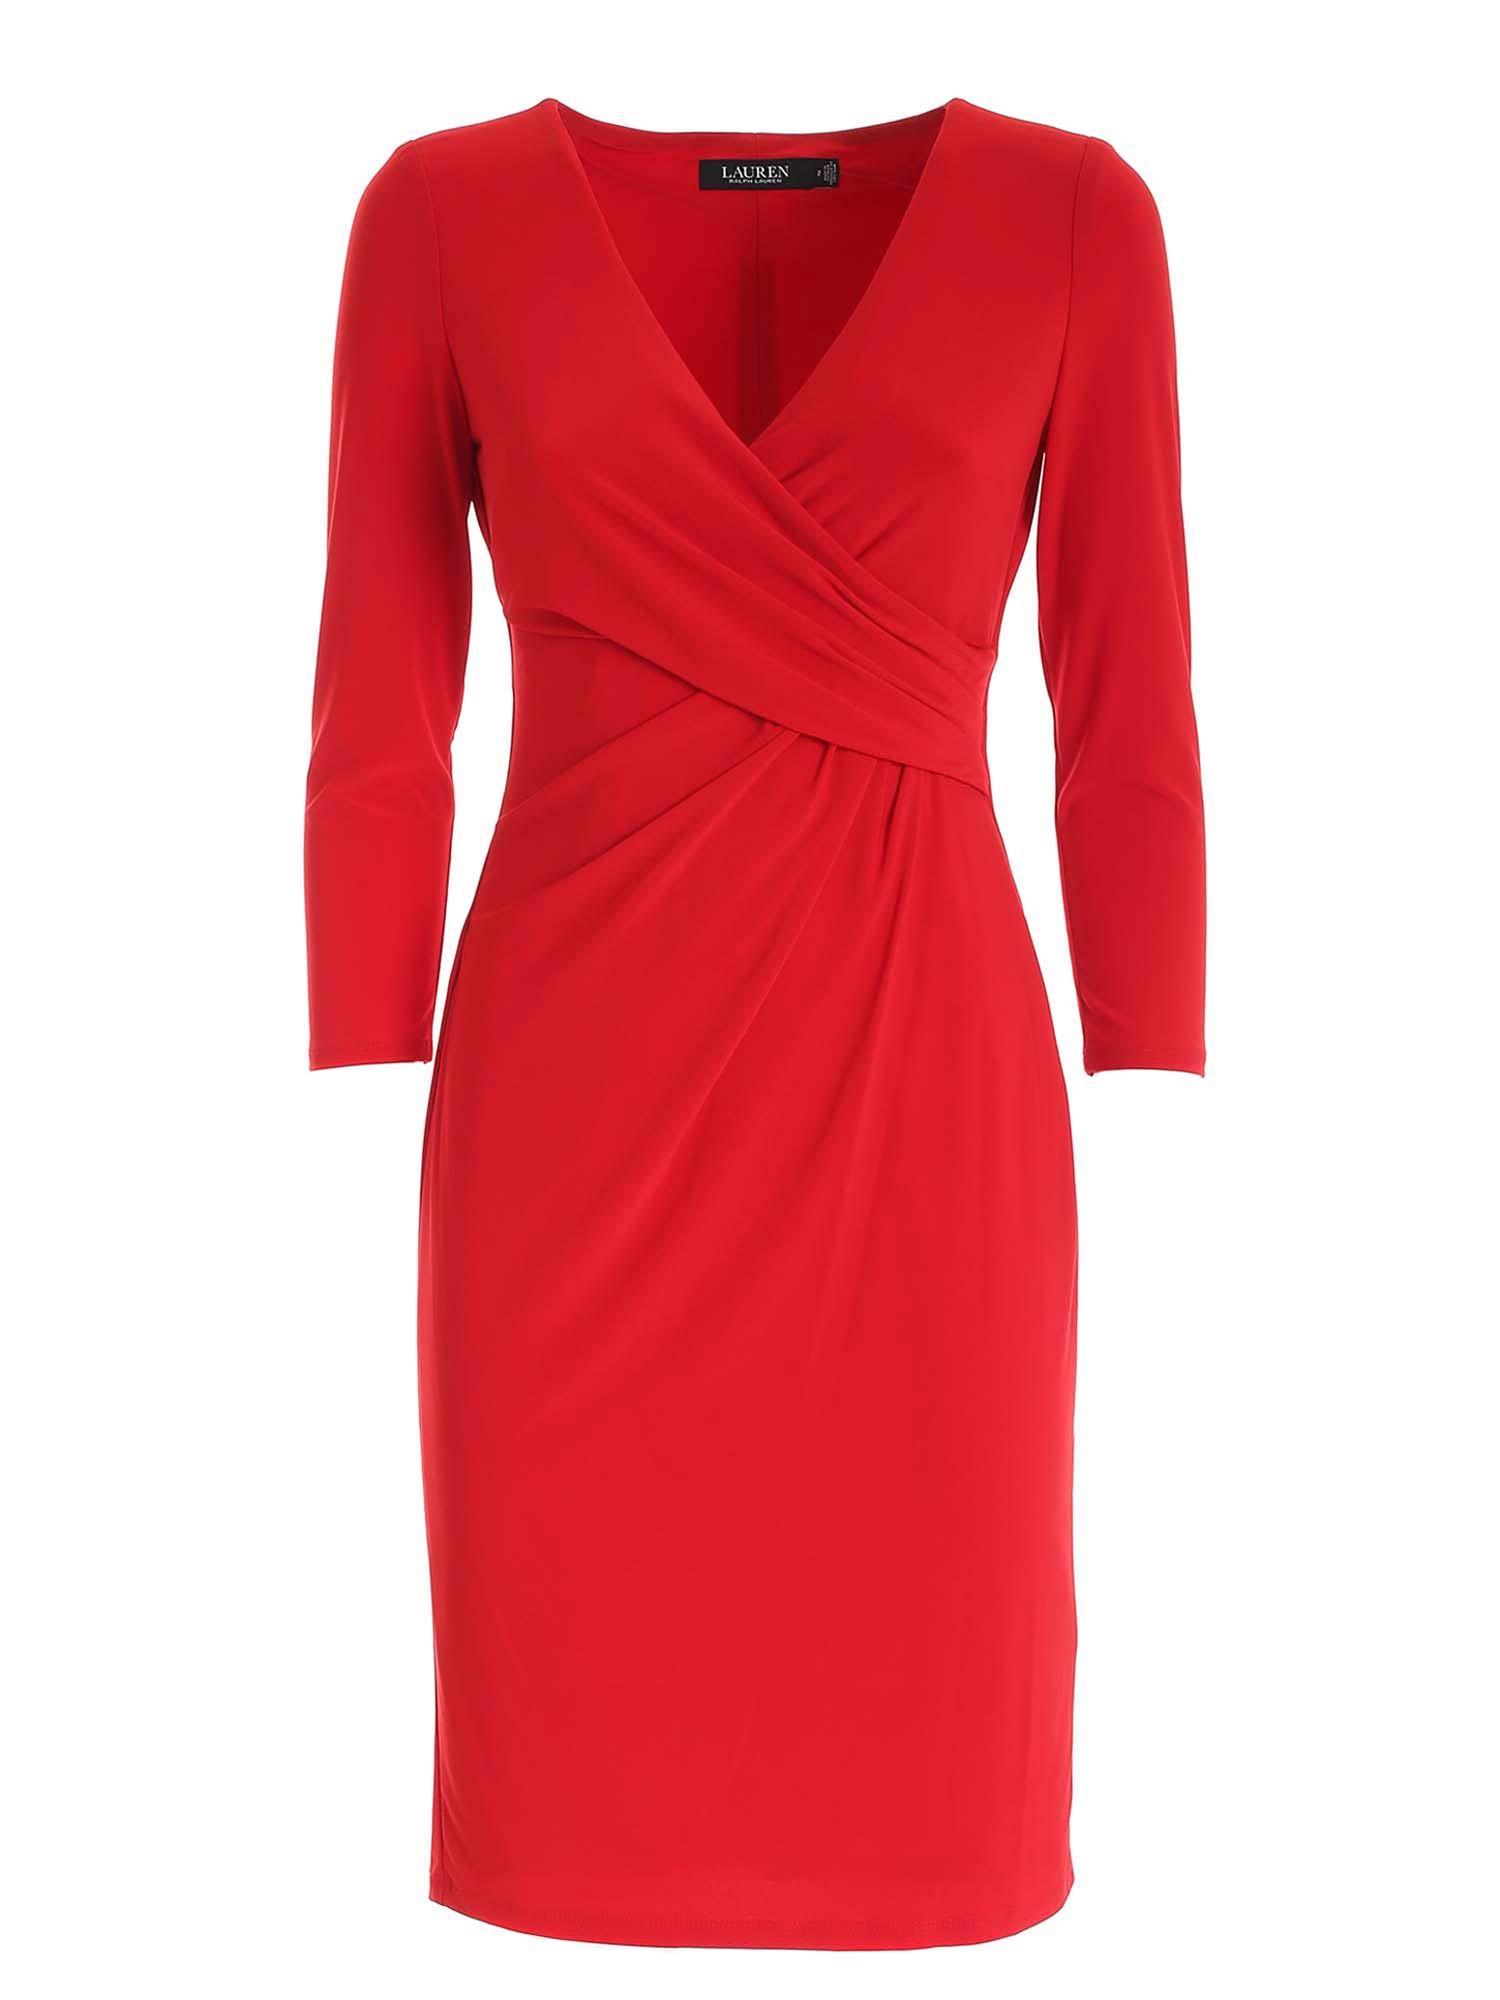 CROSSOVER V-NECK DRESS IN RED POLO RALPH LAUREN | 11 | 250768183018